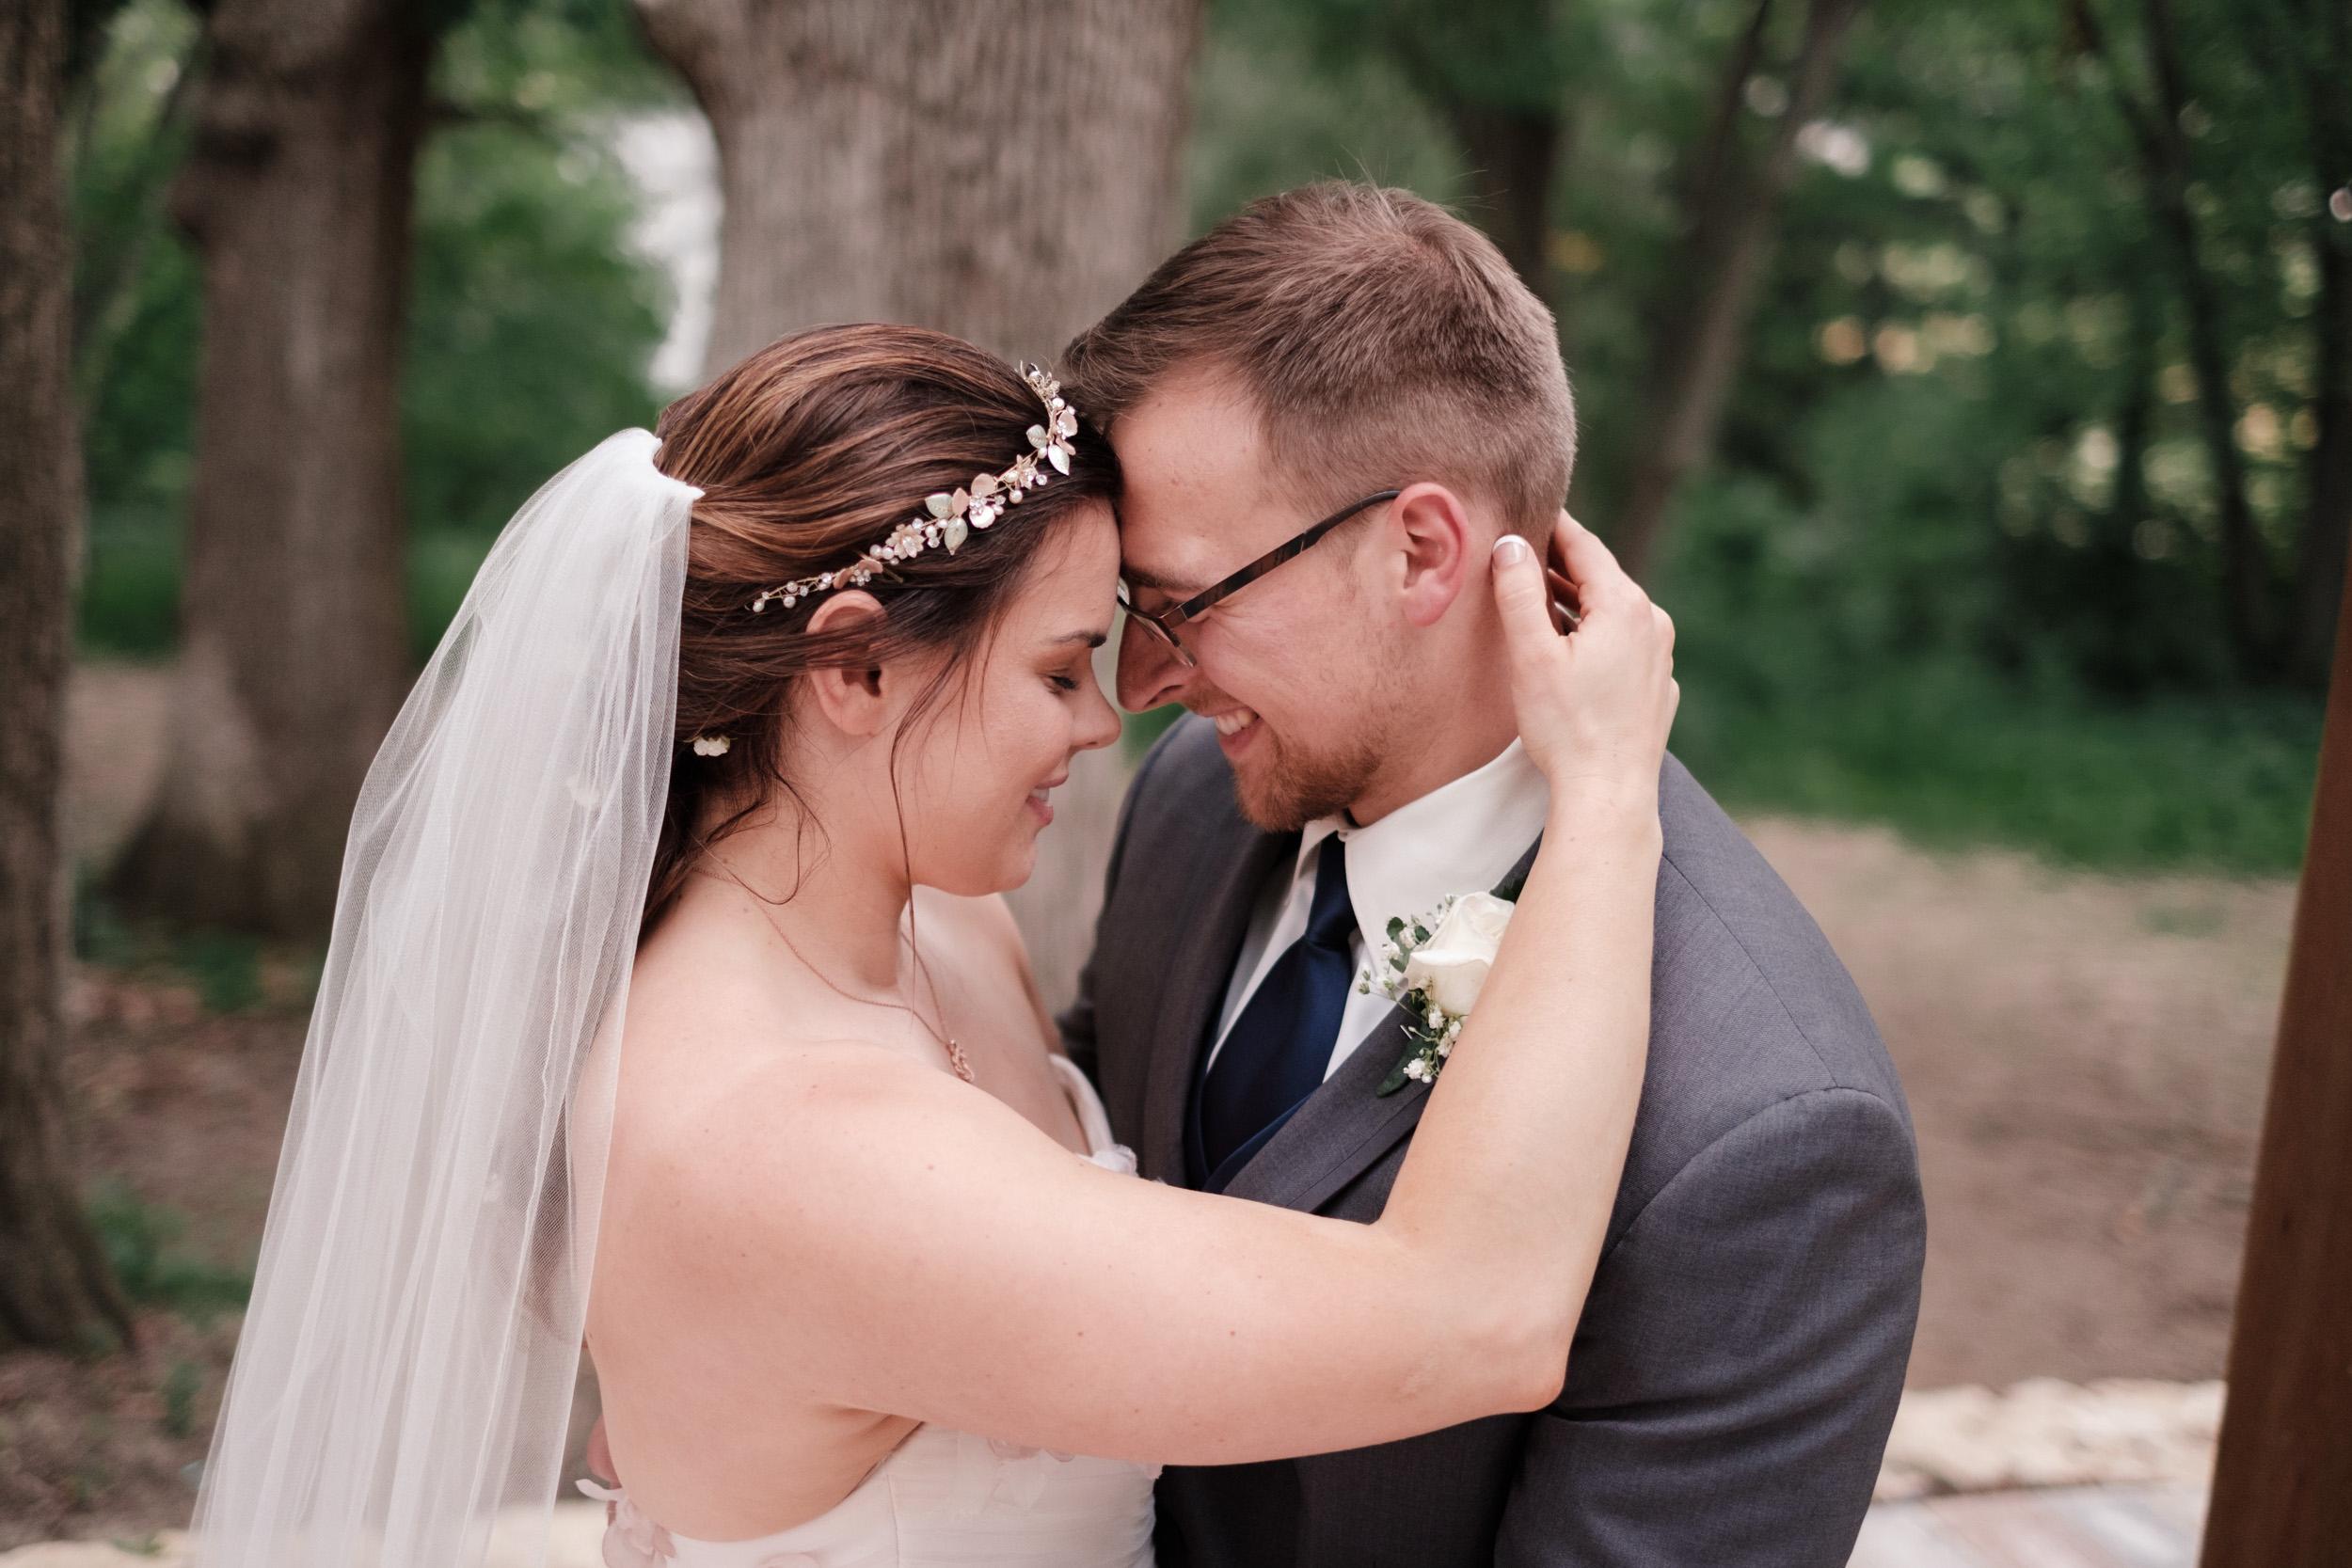 19-06-22-Ryan-Katie-The-Fields-Reserve-Wedding-41.jpg